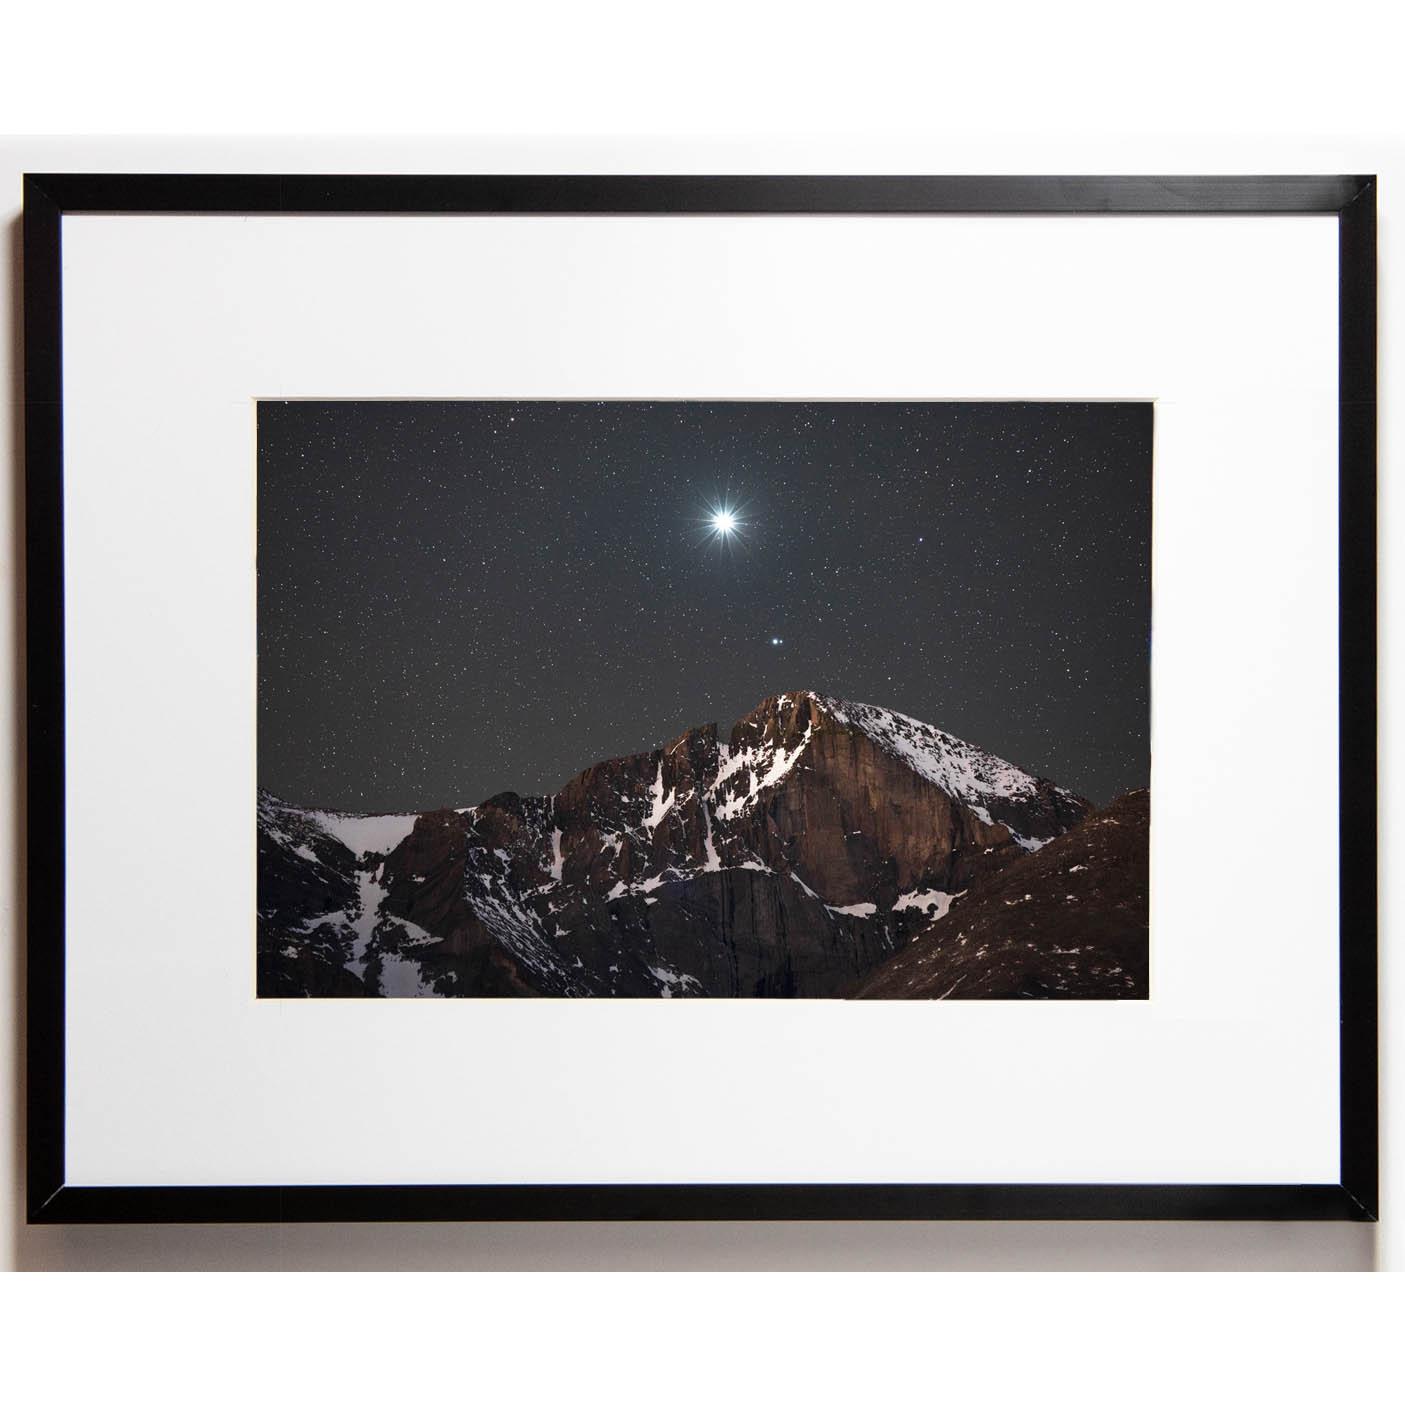 Cullis 8x12 framed - Longs Jupiter cropped